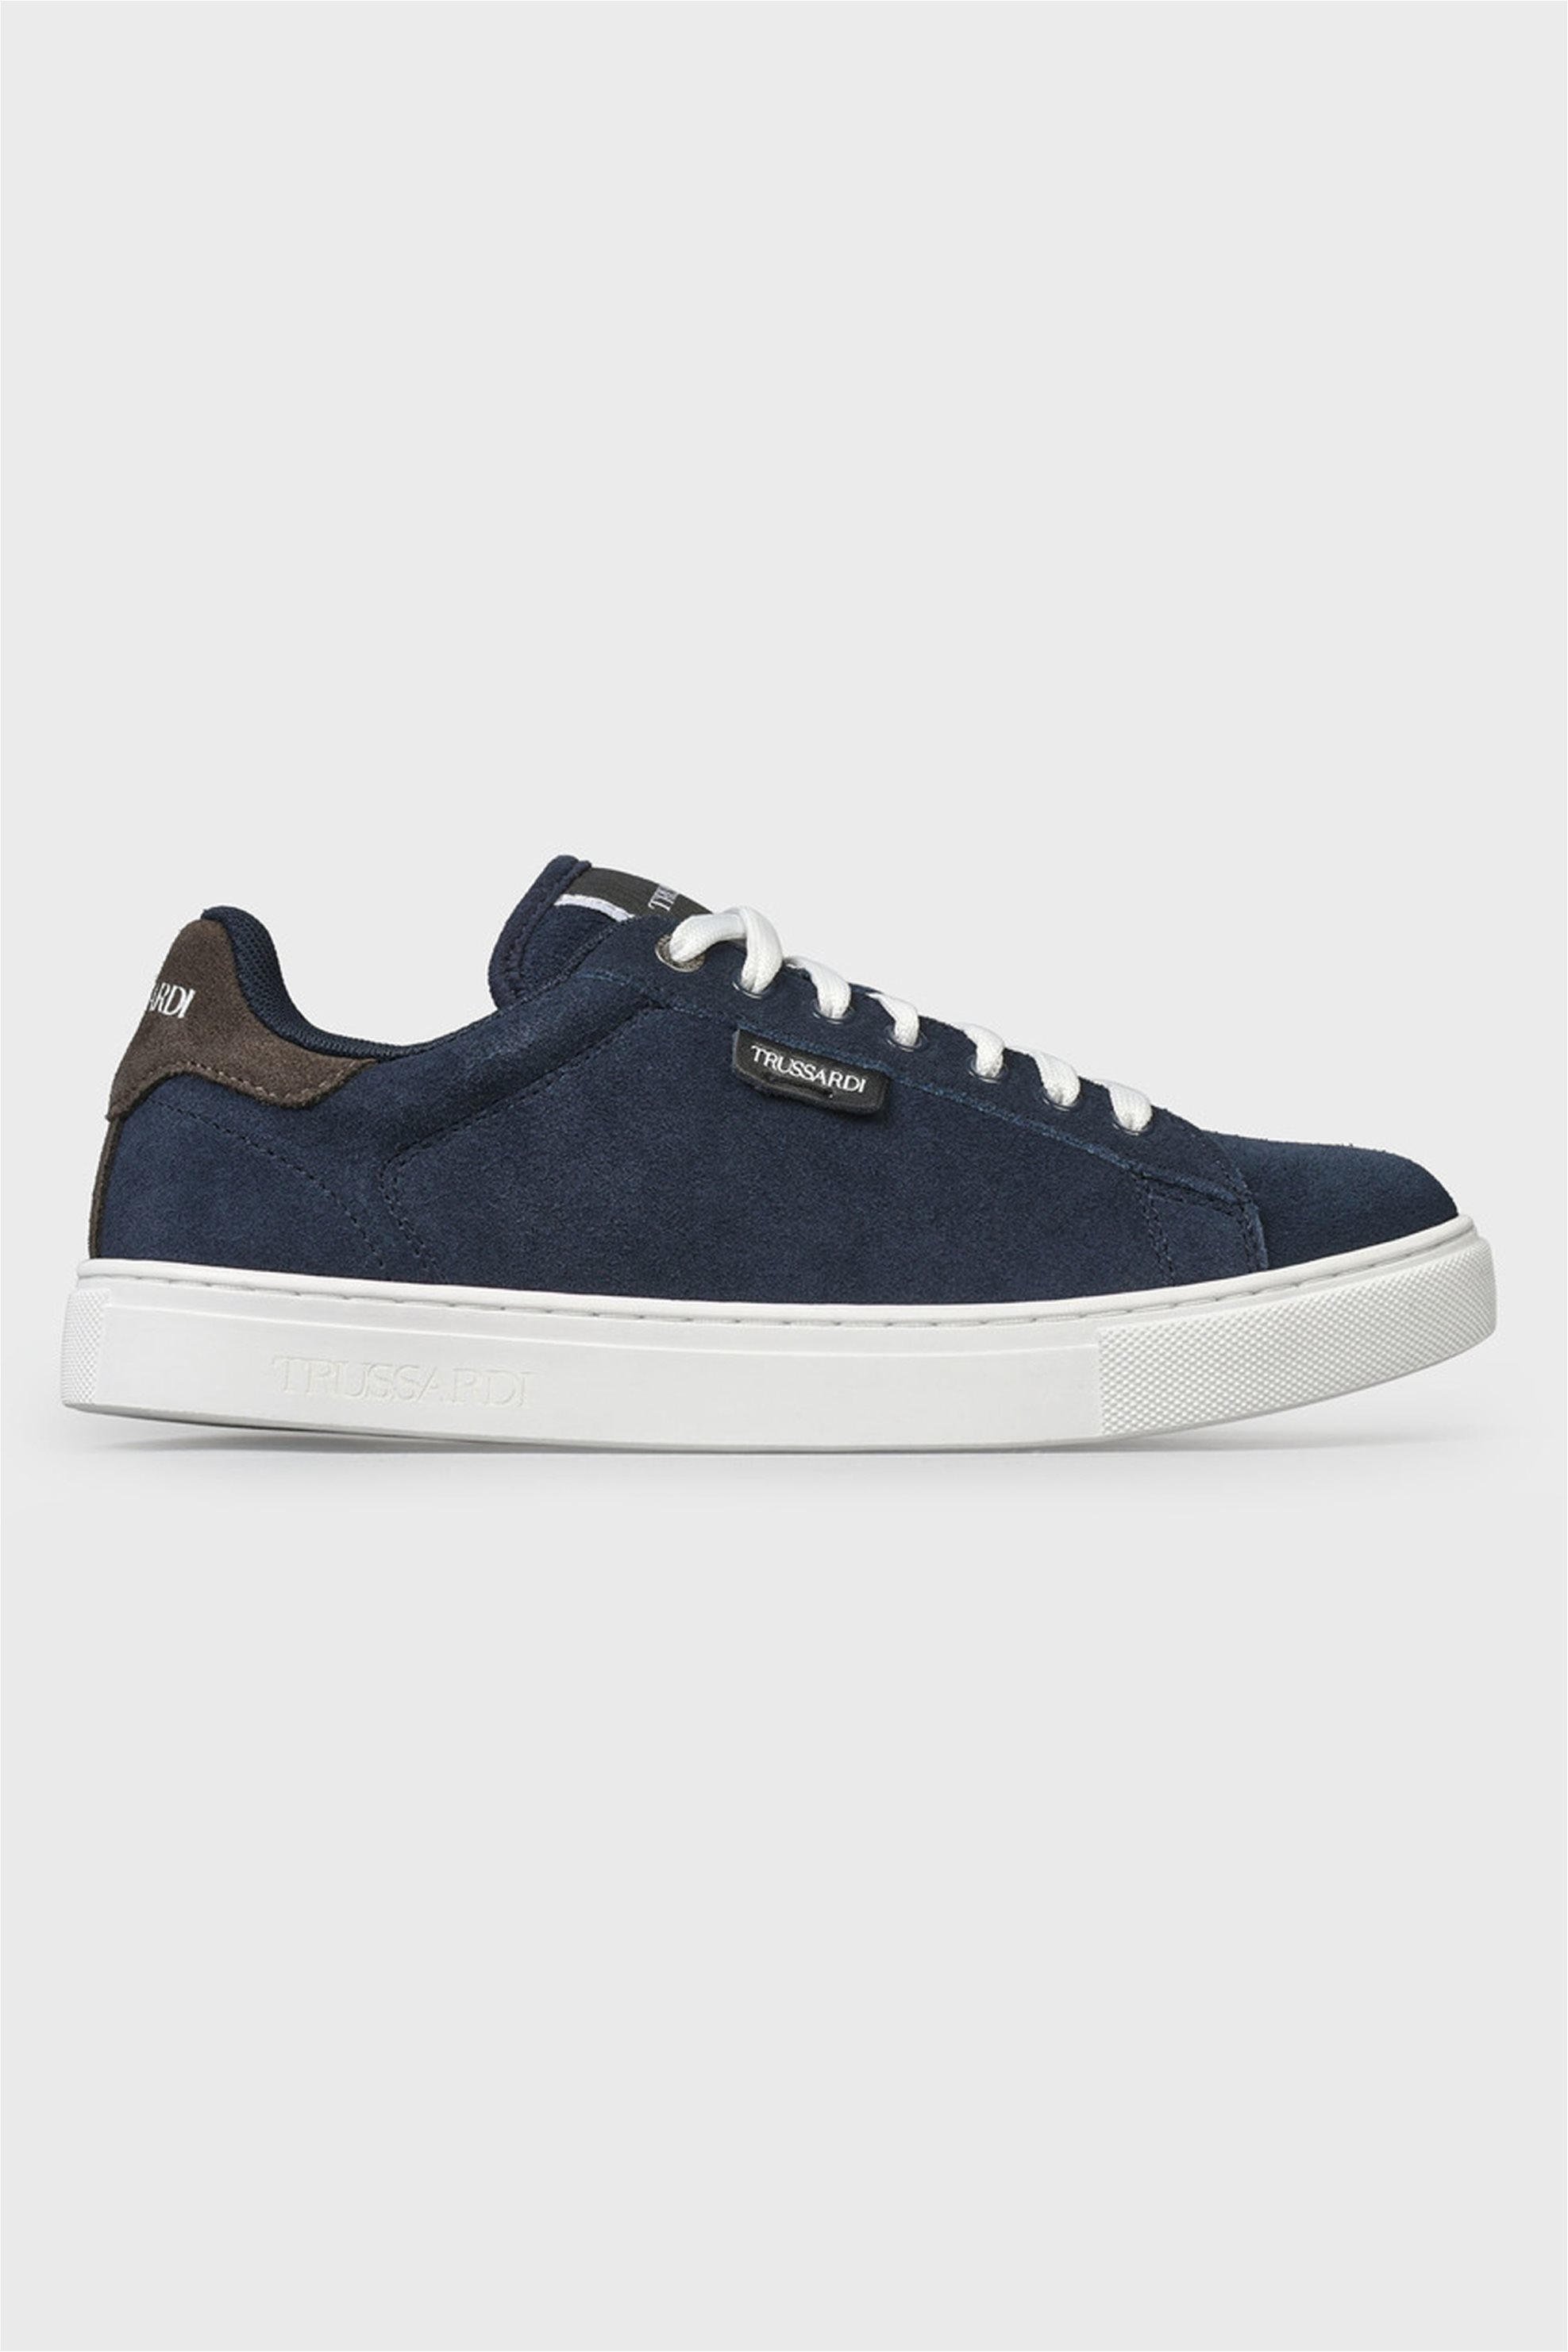 Trussardi ανδρικά suede sneakers με κορδόνια – 77A00270-9Y099997 – Μπλε Σκούρο